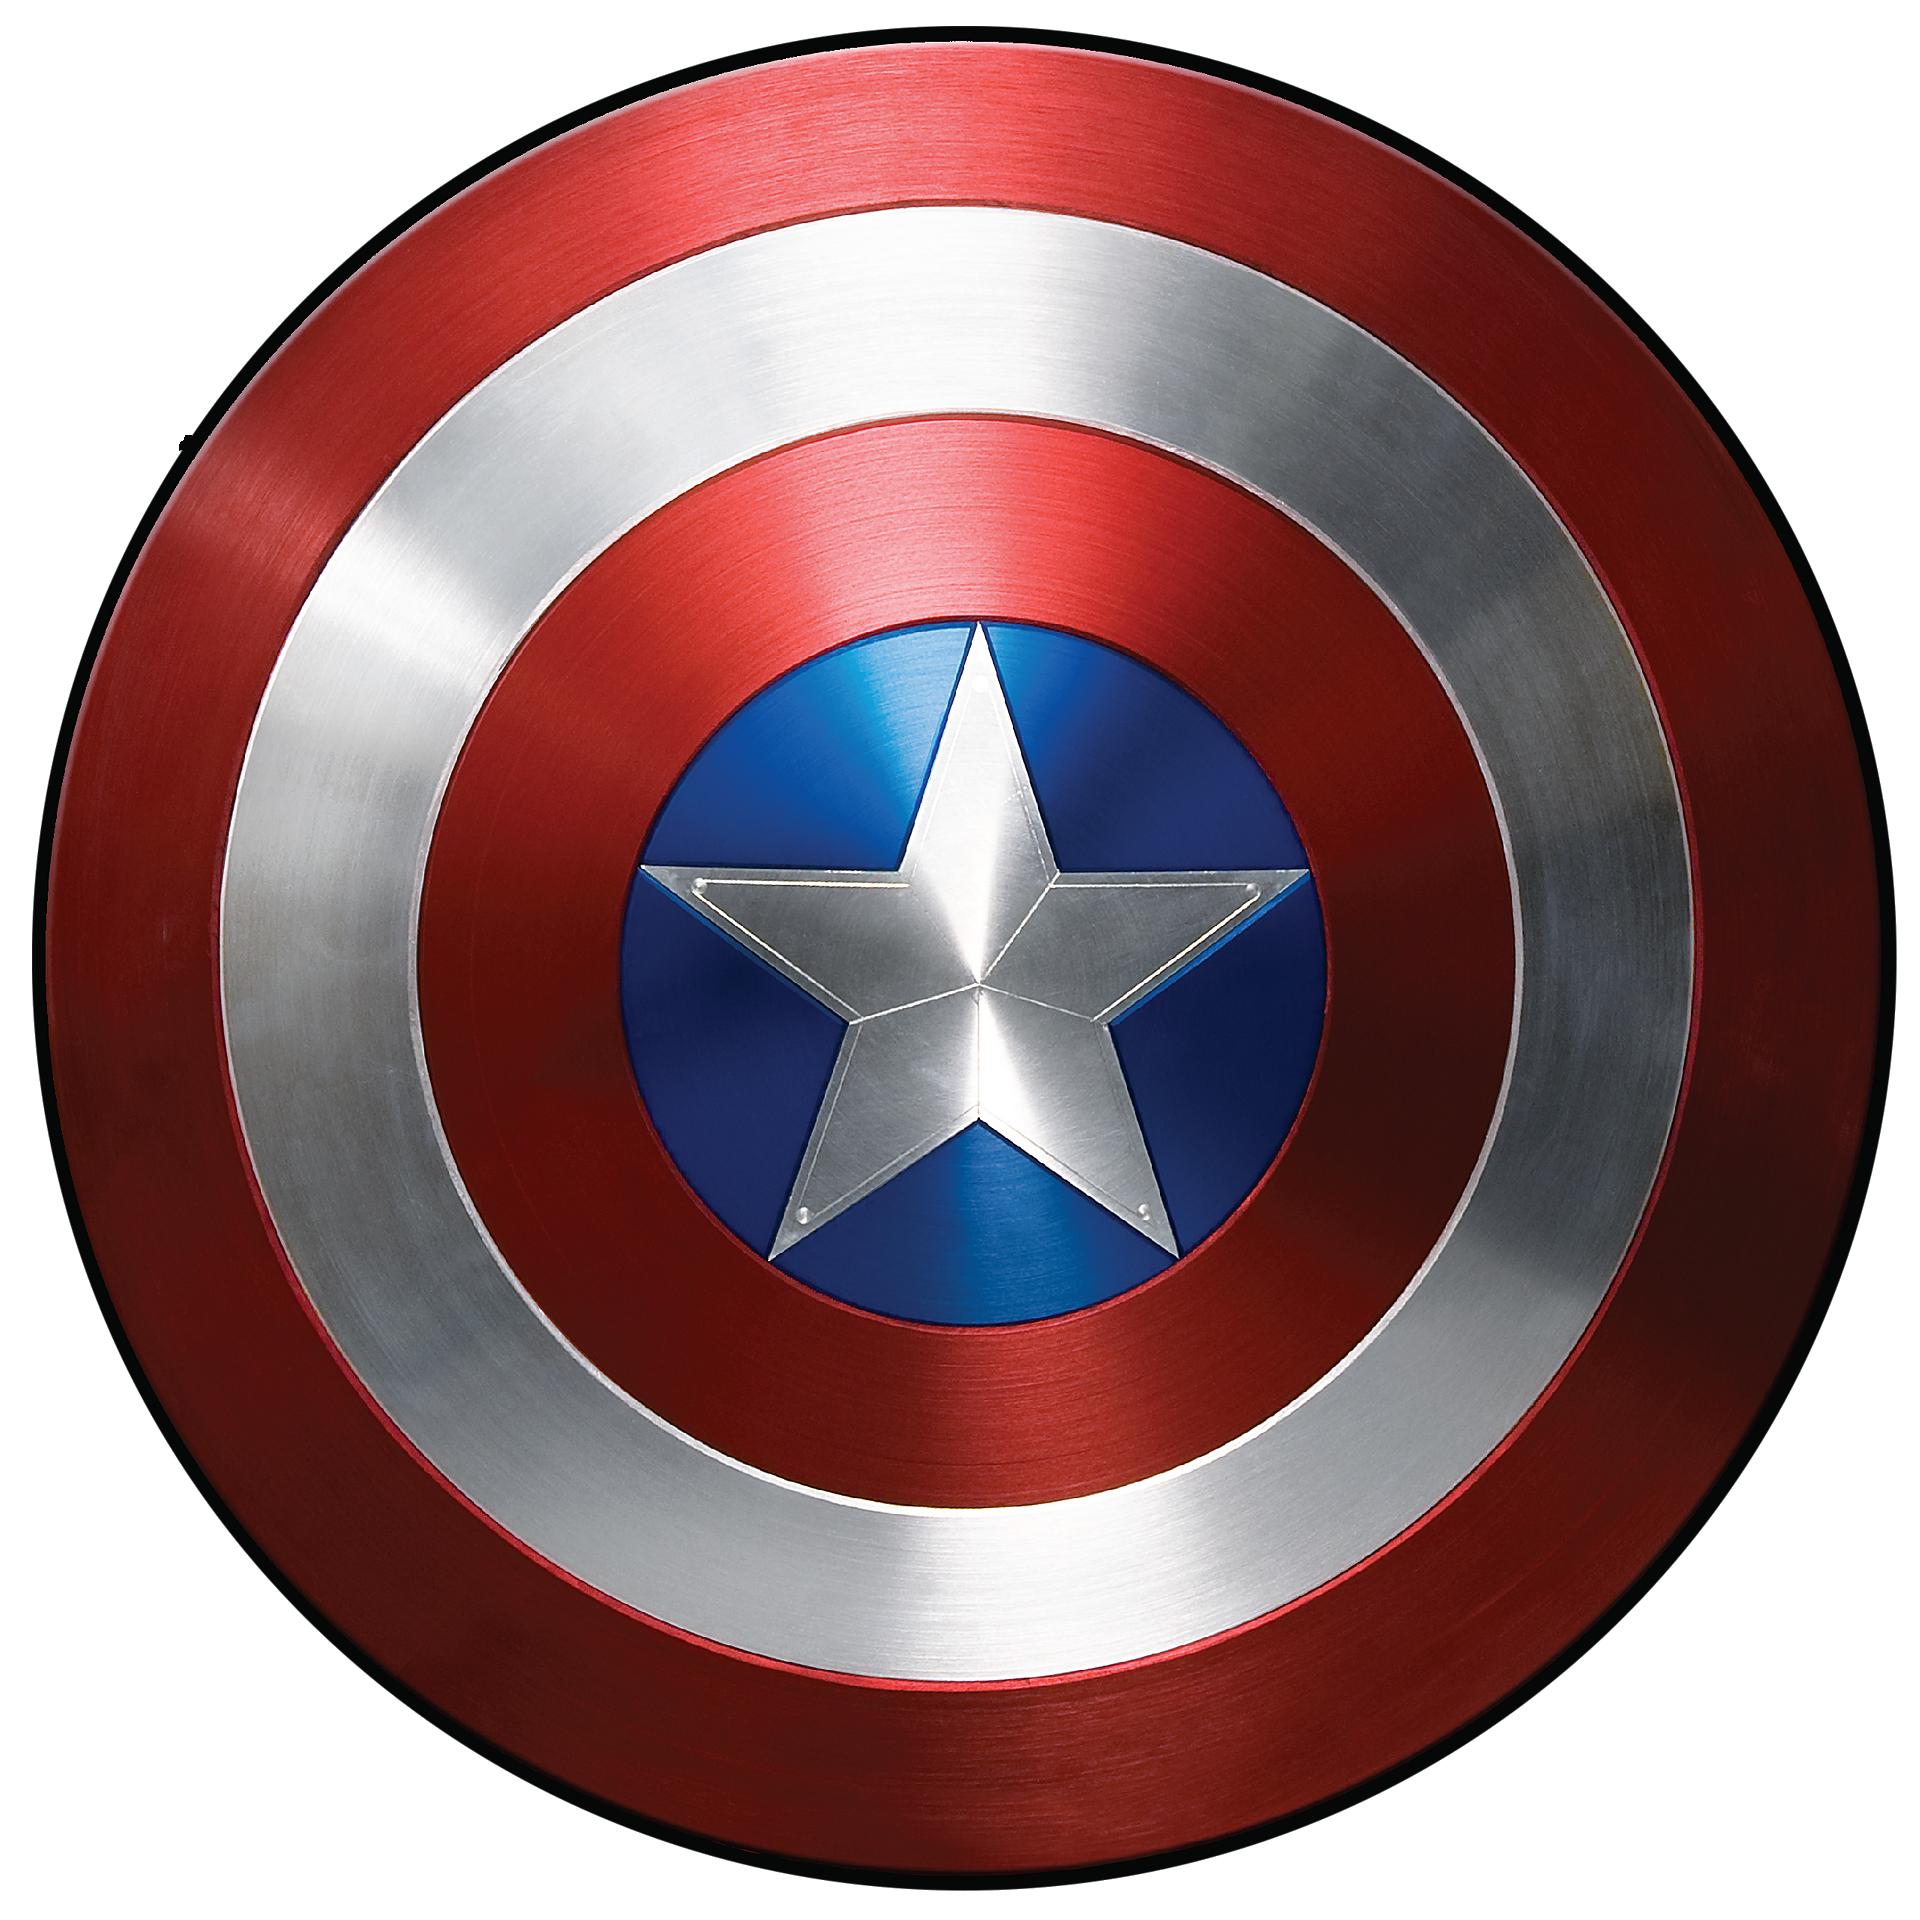 captain america 39 s shield disney wiki fandom powered by. Black Bedroom Furniture Sets. Home Design Ideas